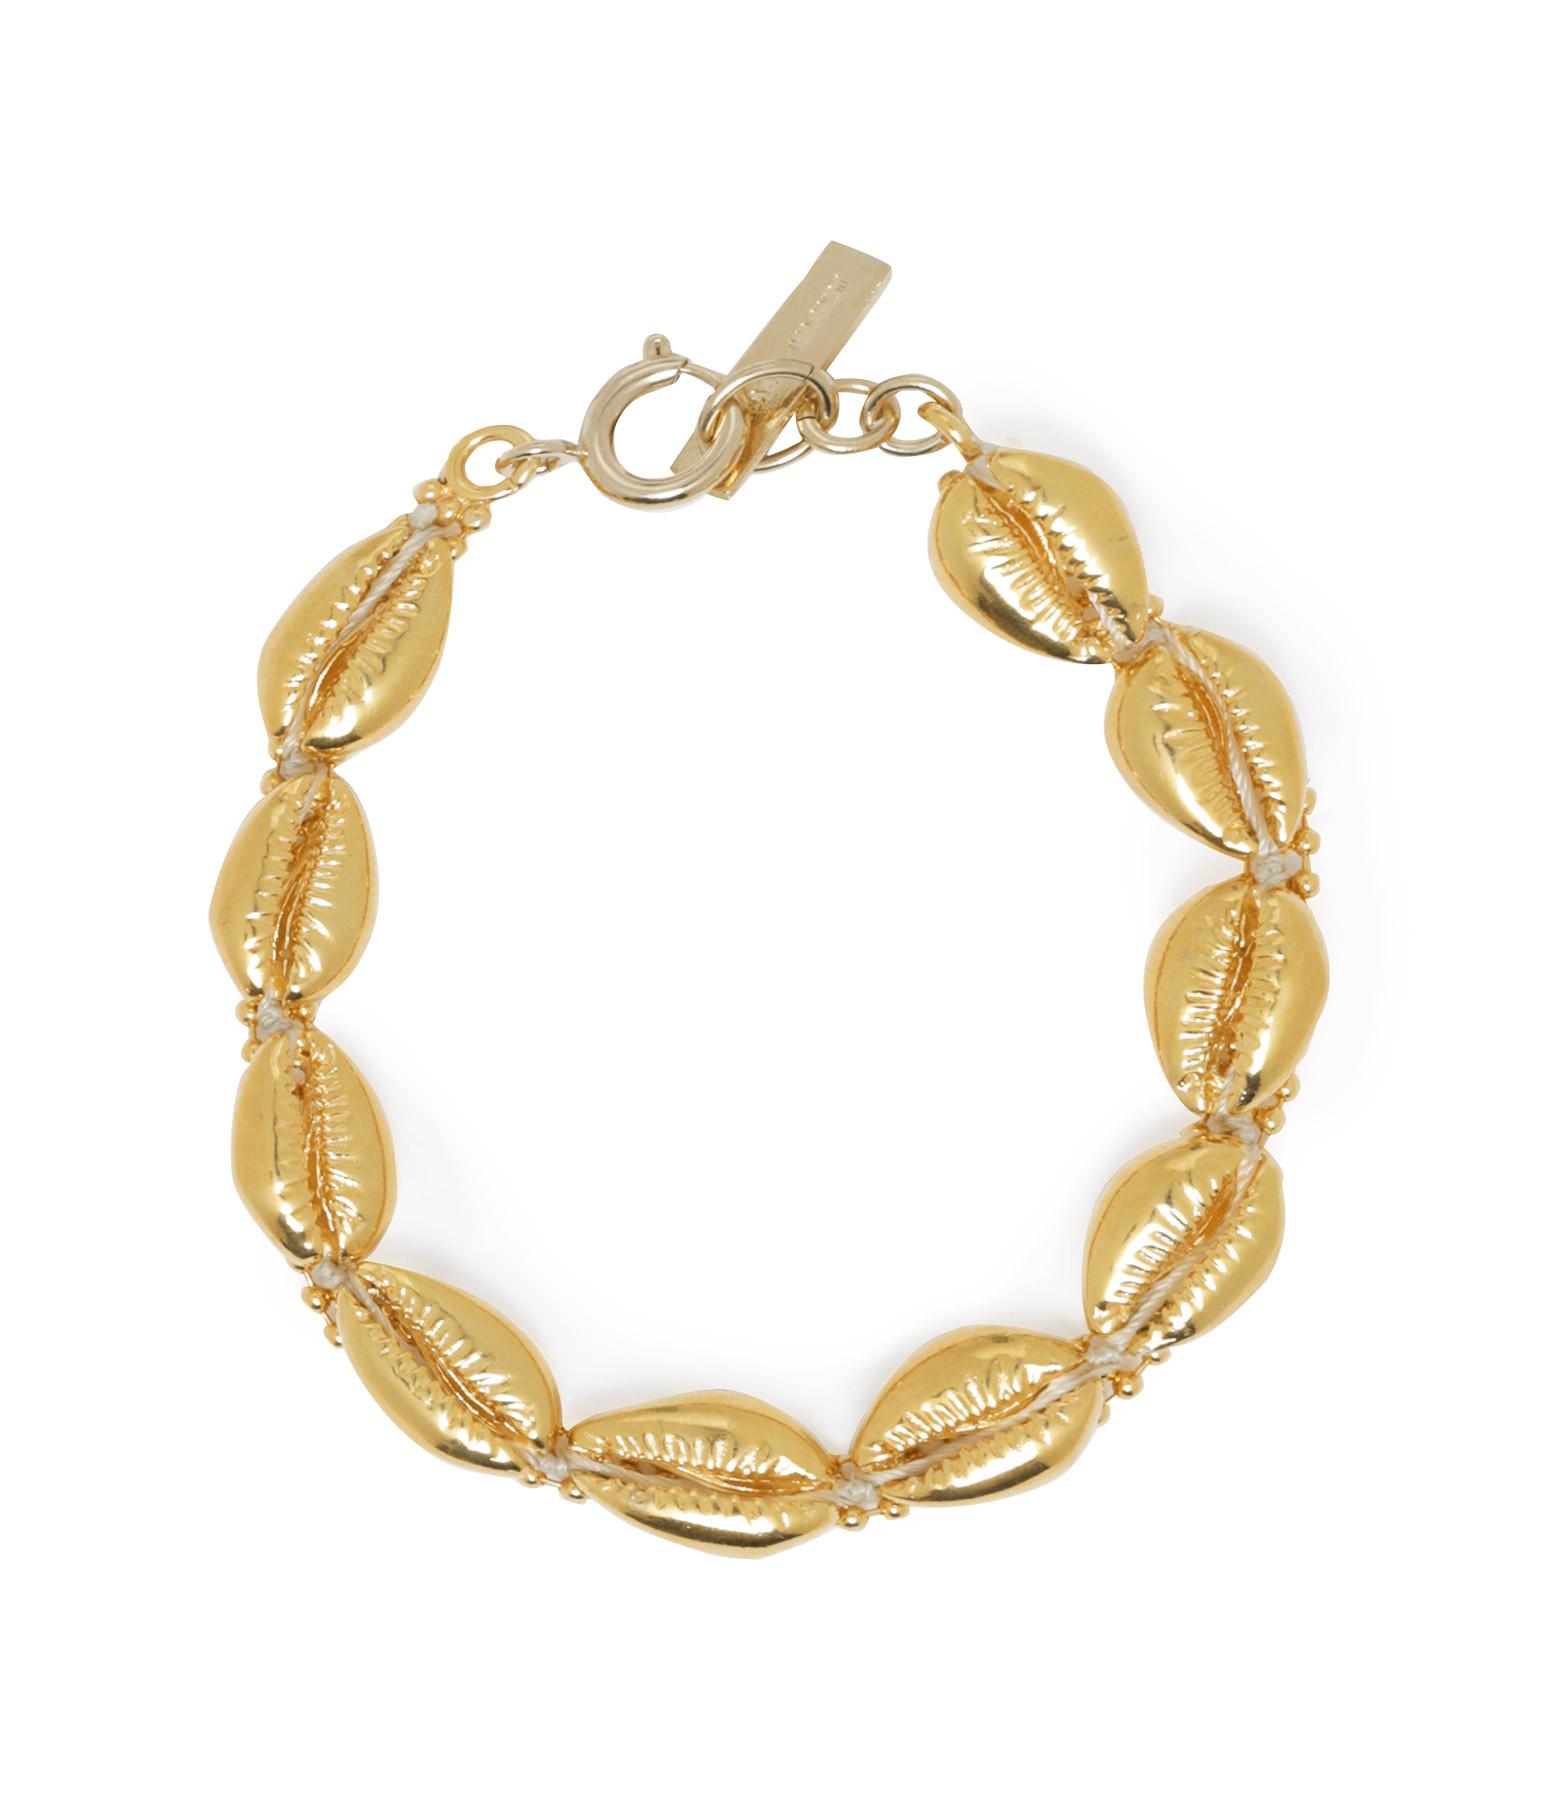 ISABEL MARANT - Bracelet Amer Laiton Doré